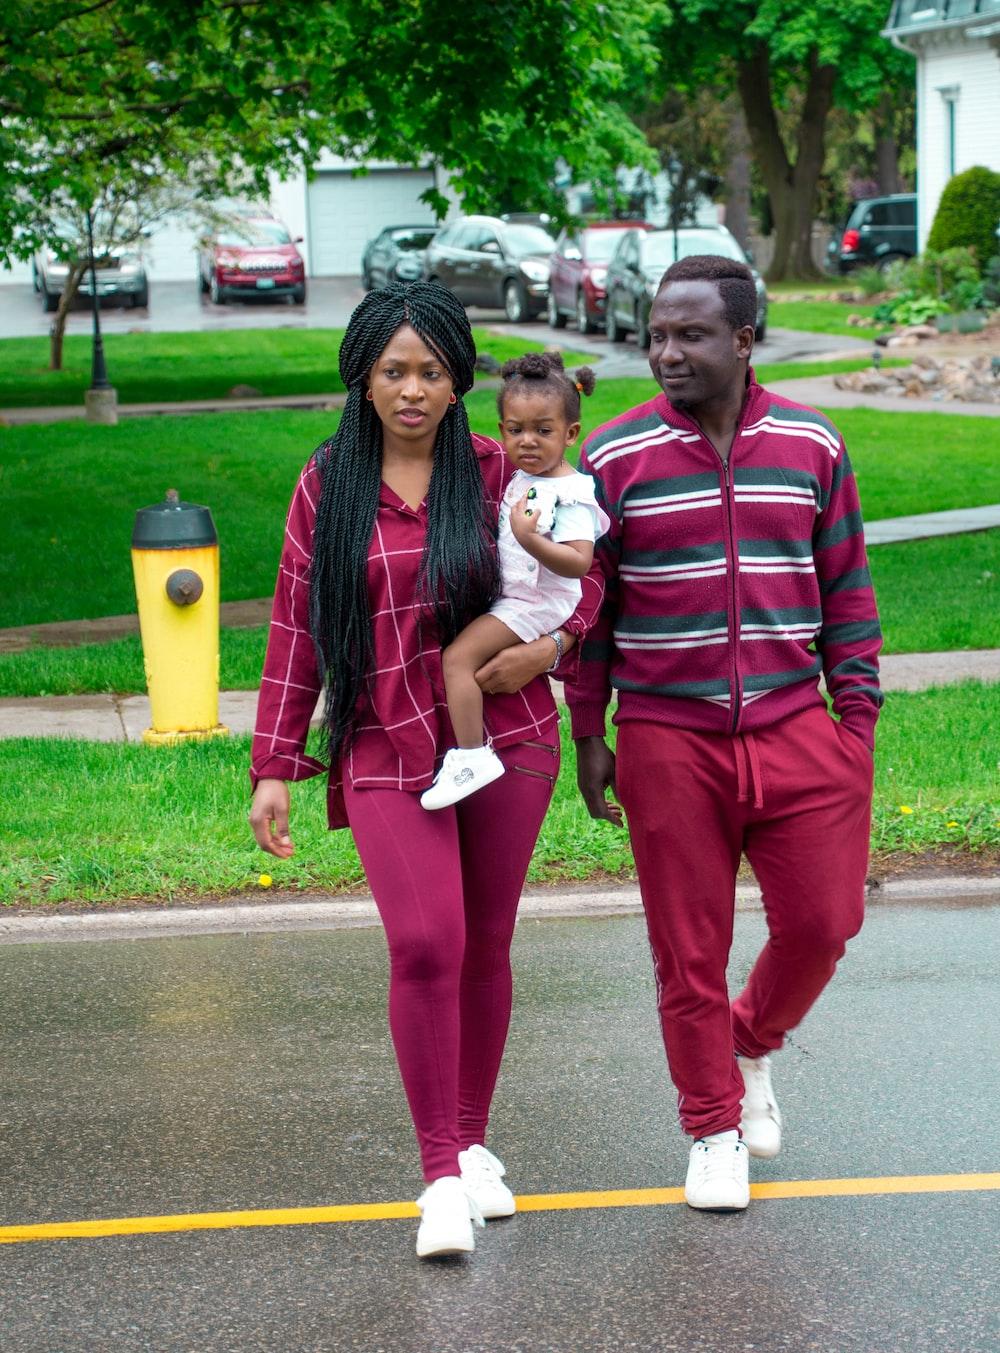 woman wearing purple long-sleeved shirt and purple leggings carrying toddler walking on streeet